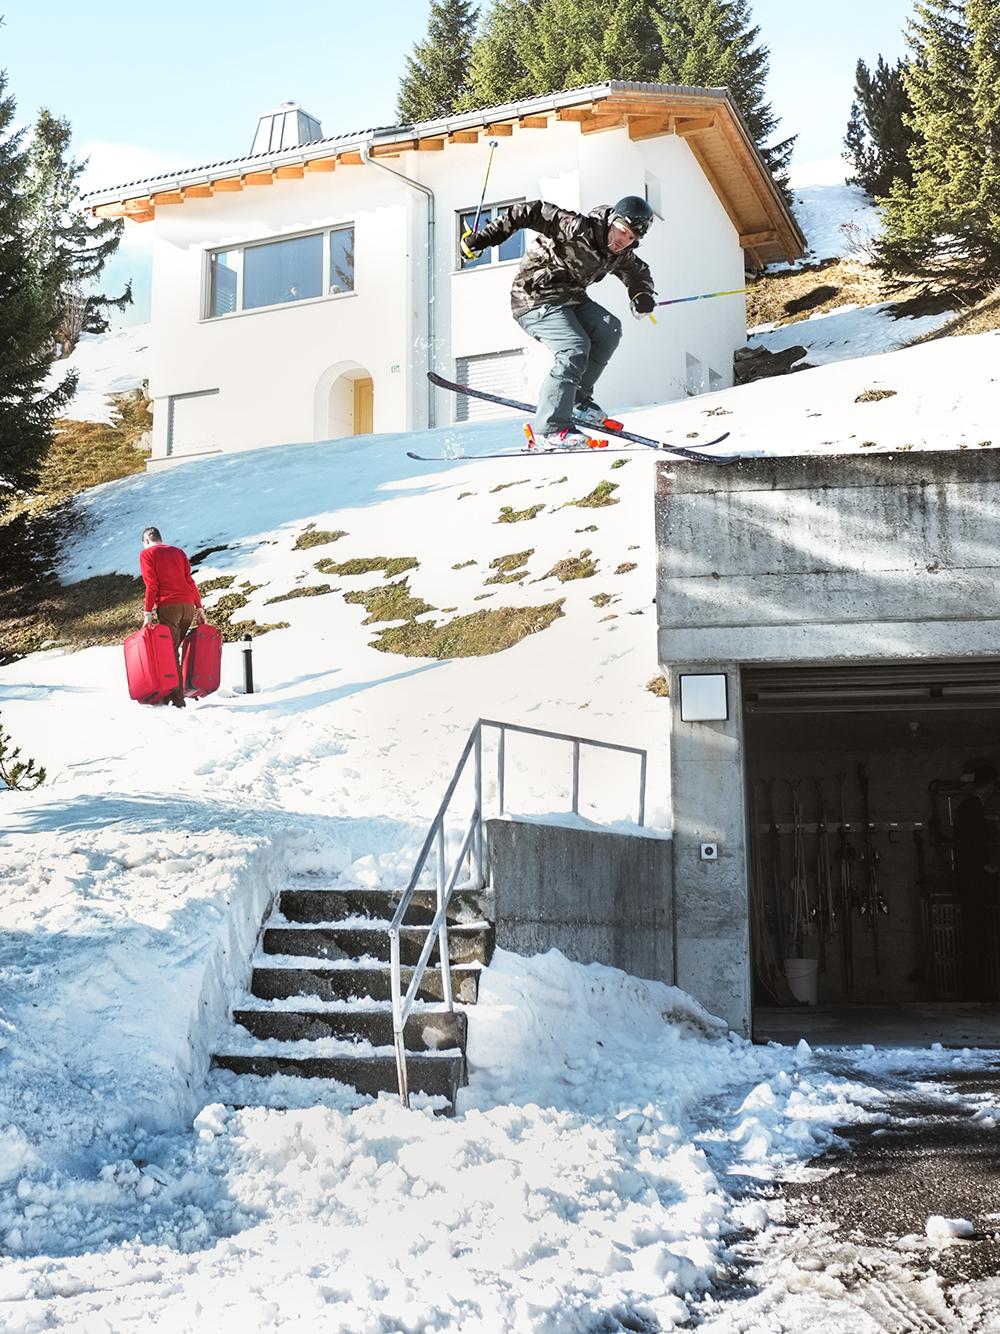 Rider_DanielLoosli_Trick_Lipslide_Gap_Location_Graubünden_Photographer_YannickHermann